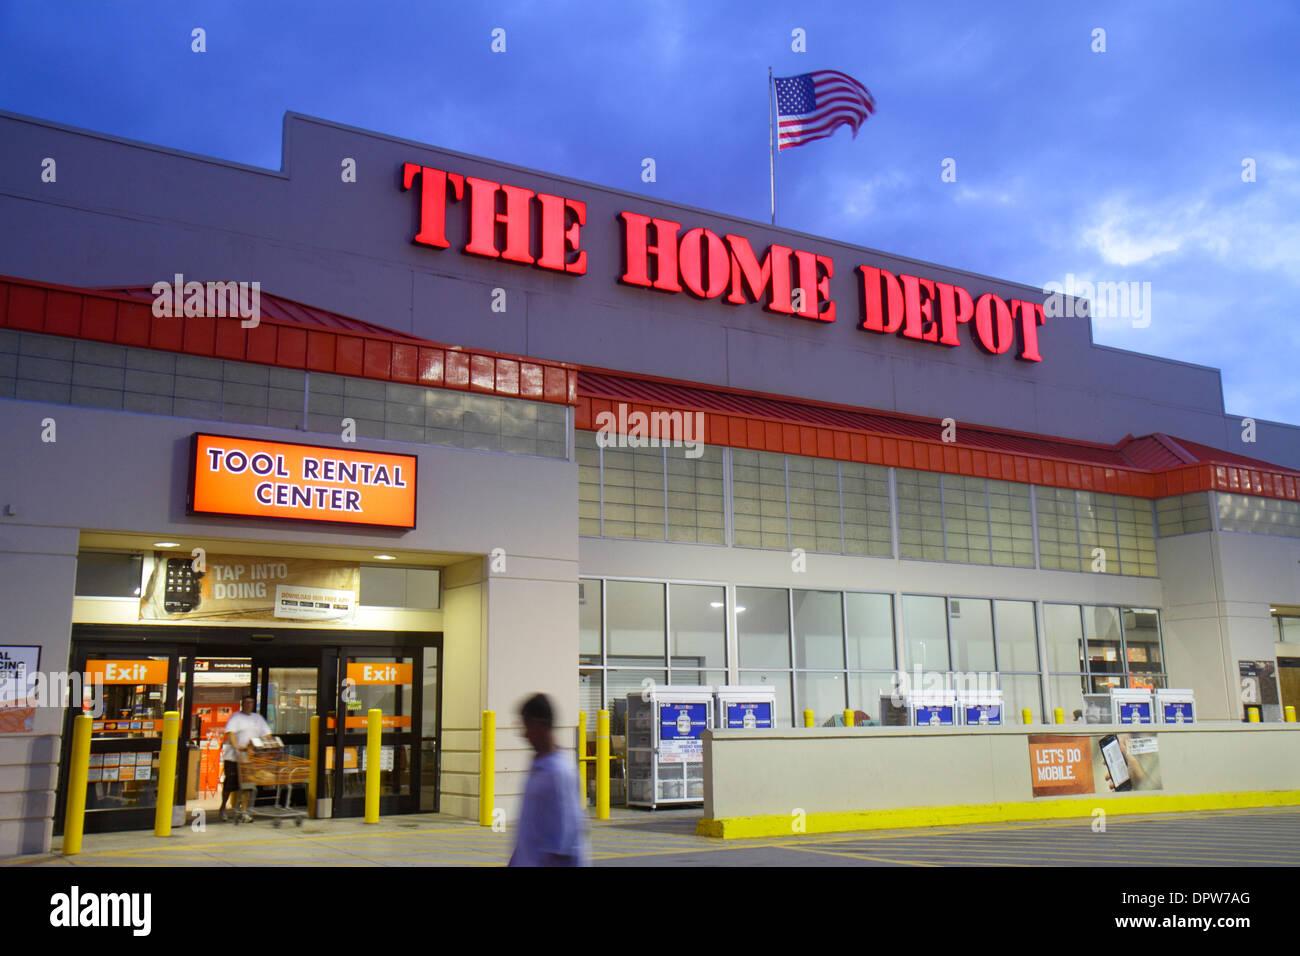 Miami Florida Little Havanna Calle Ocho Home Depot Hardware Geschäft